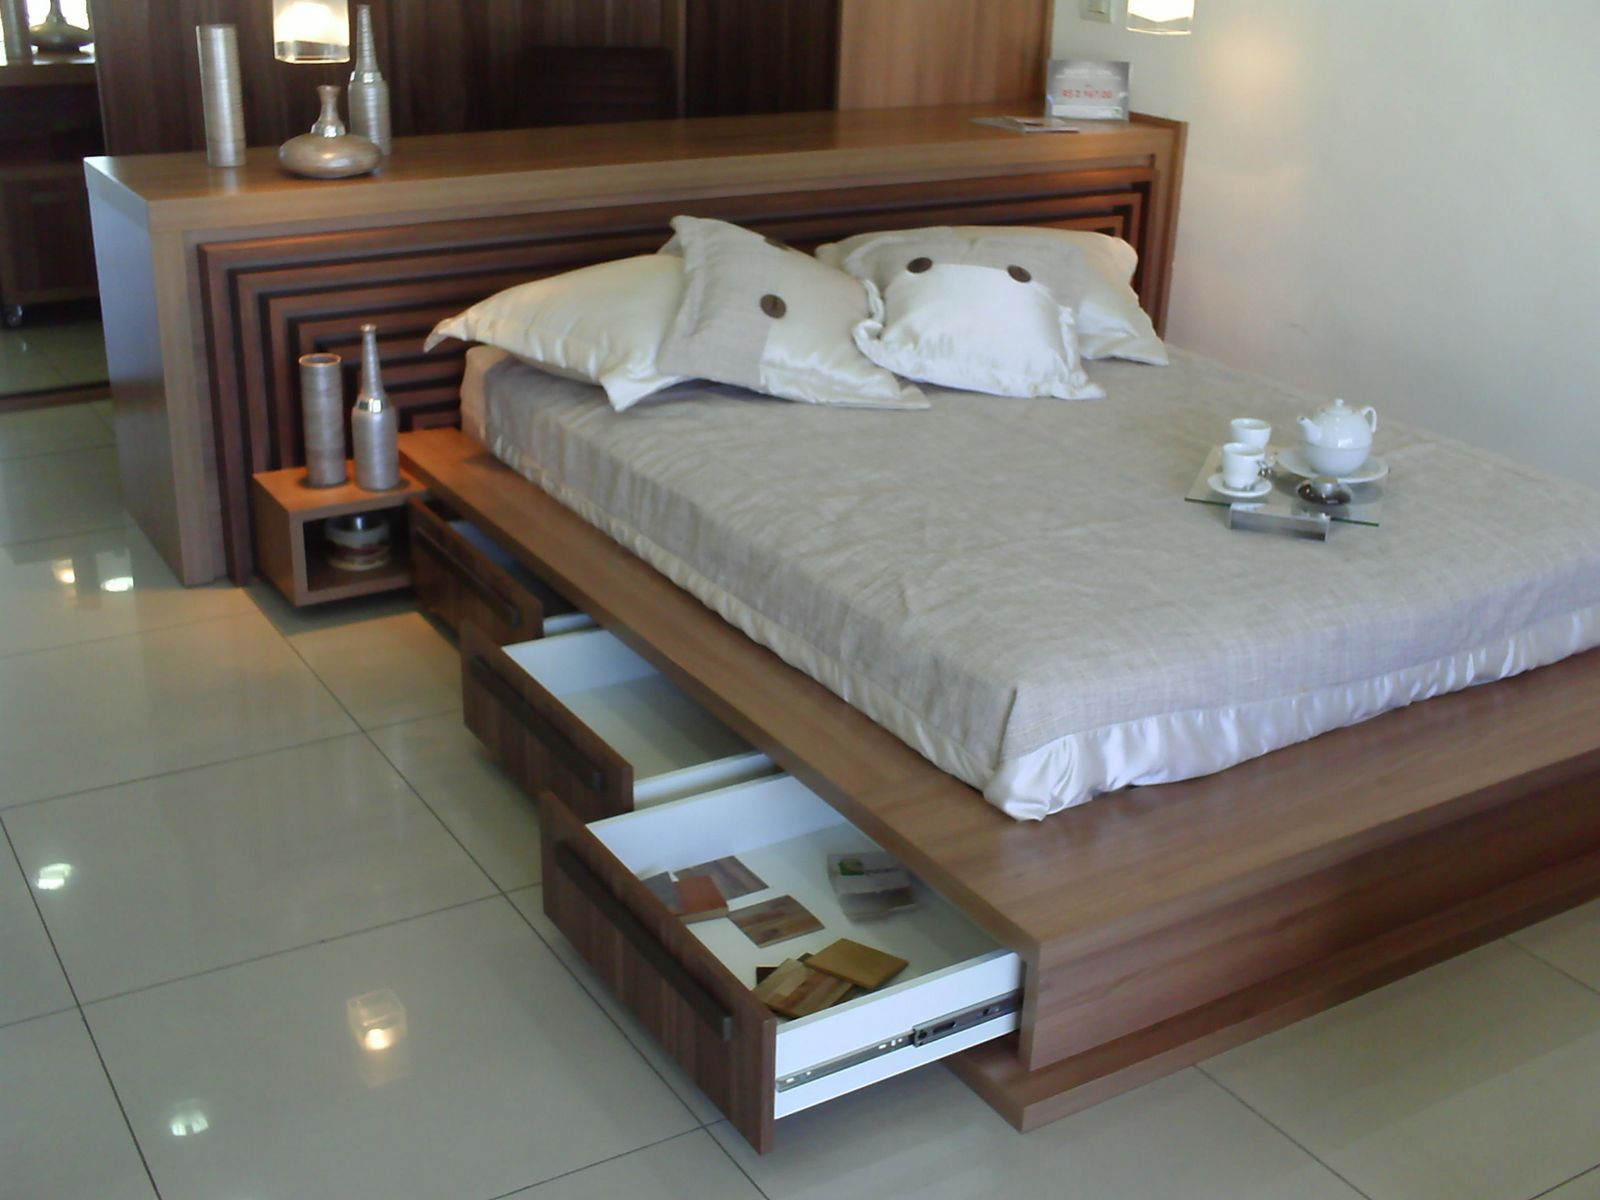 Click to close muebles casa pinterest camas camas for Muebles 1 click opiniones